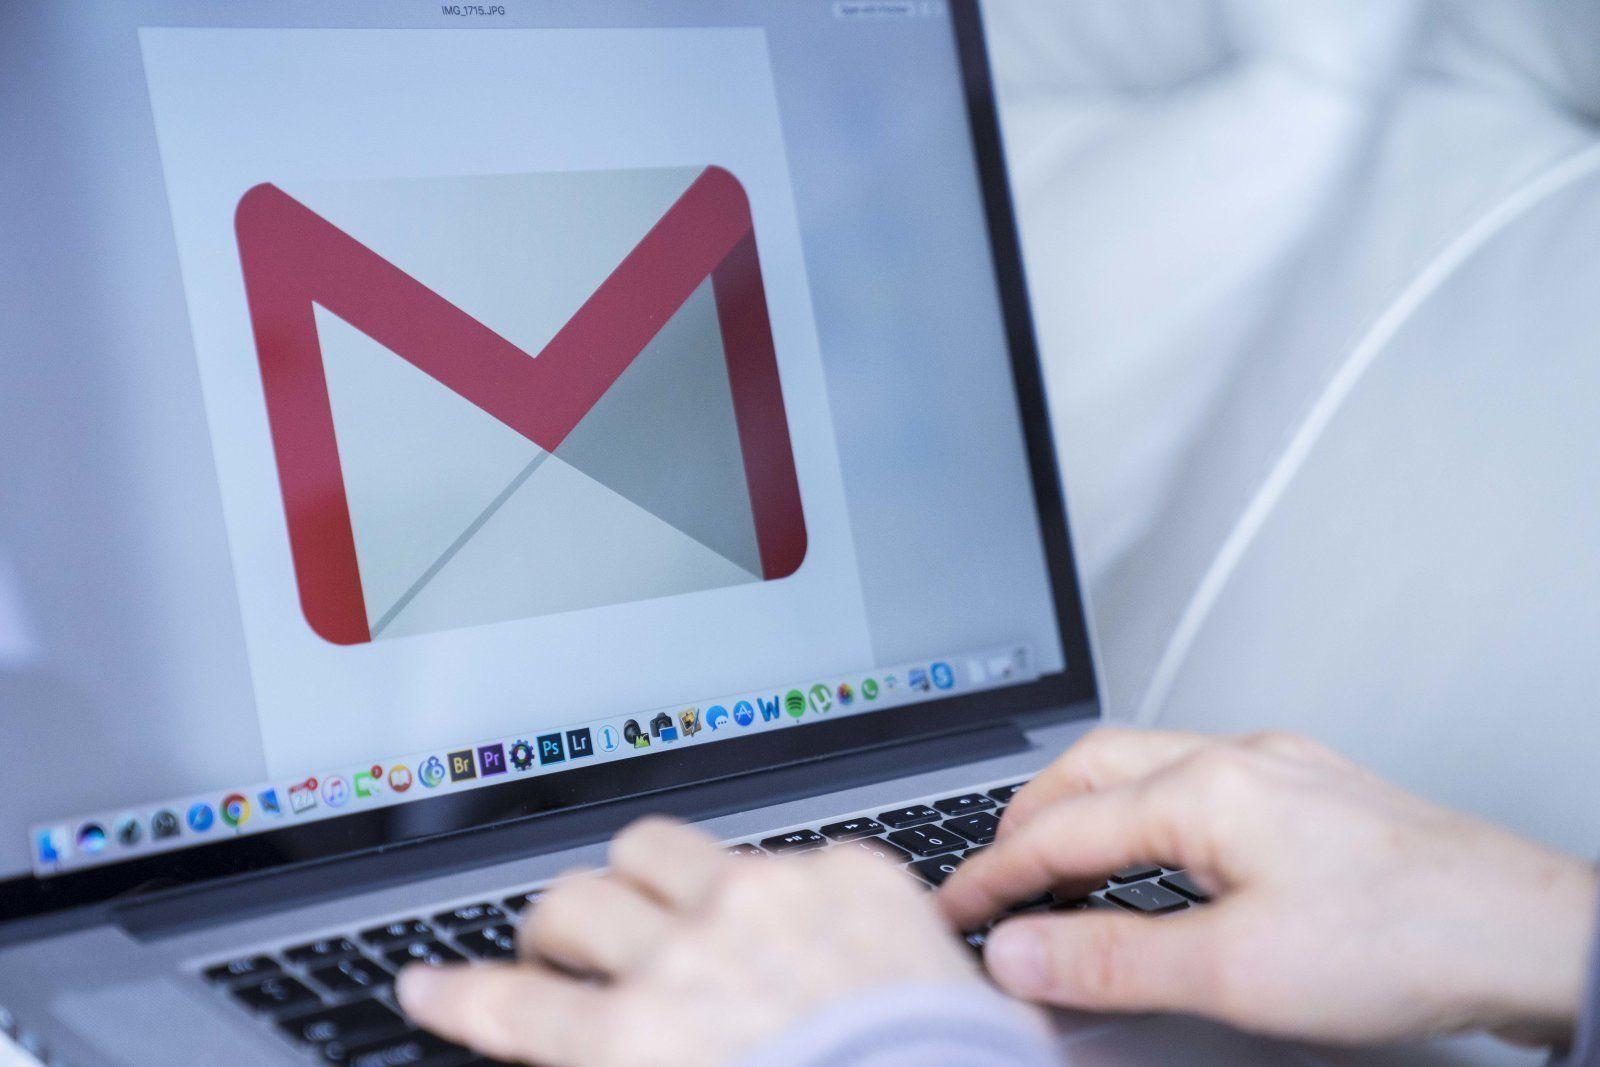 Former Gmail designer builds Chrome extension to declutter